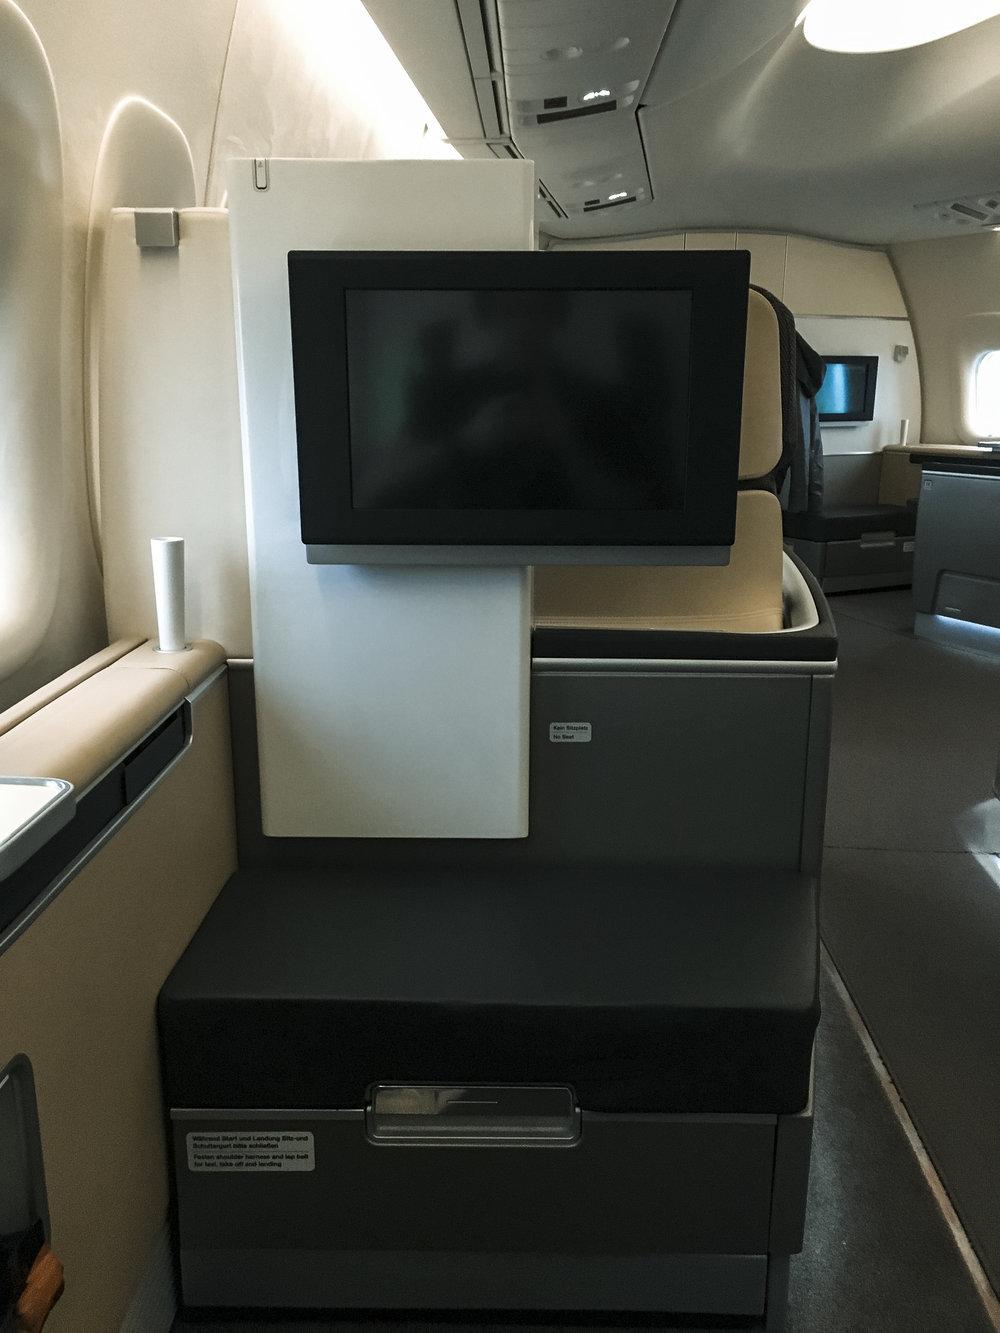 Lufthansa-0859.jpg